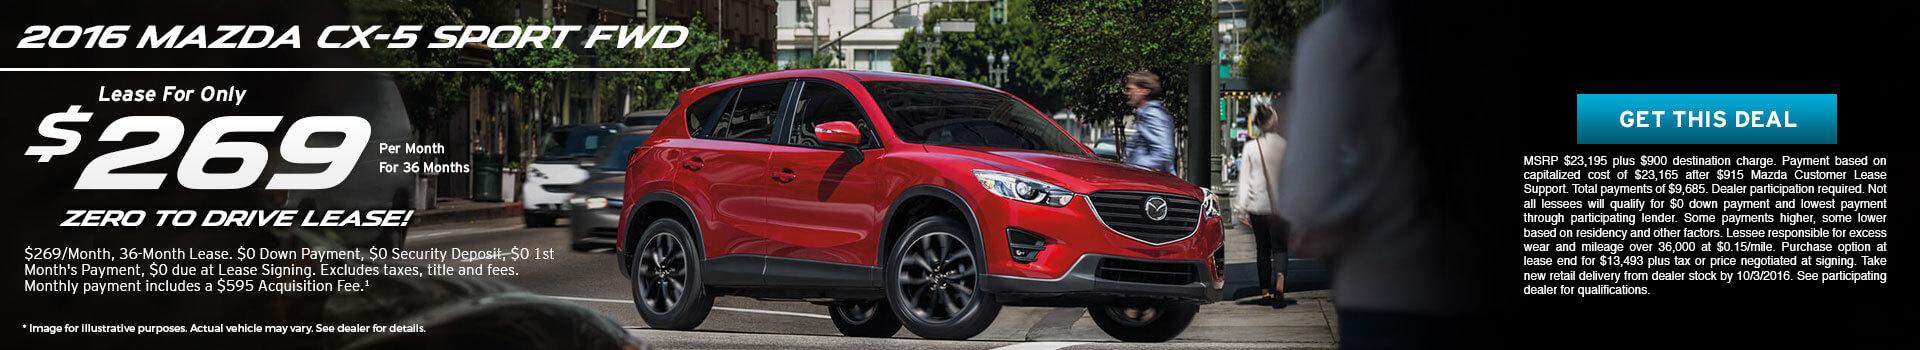 26 New Mazda Cx 5 In Stock Serving San Diego Chula Vista